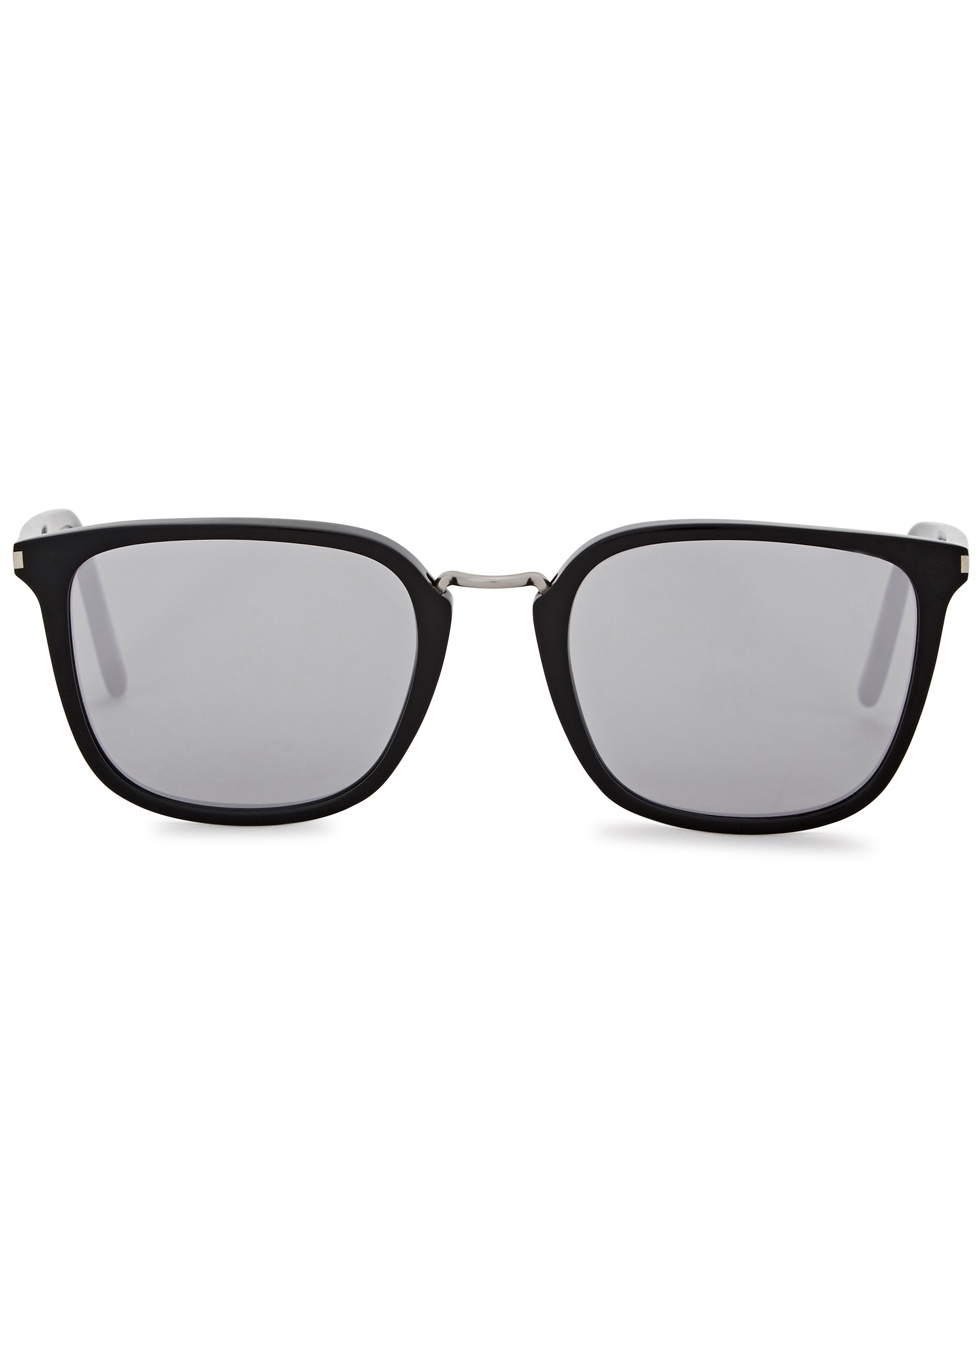 SL 131 mirrored square-frame sunglasses - Saint Laurent